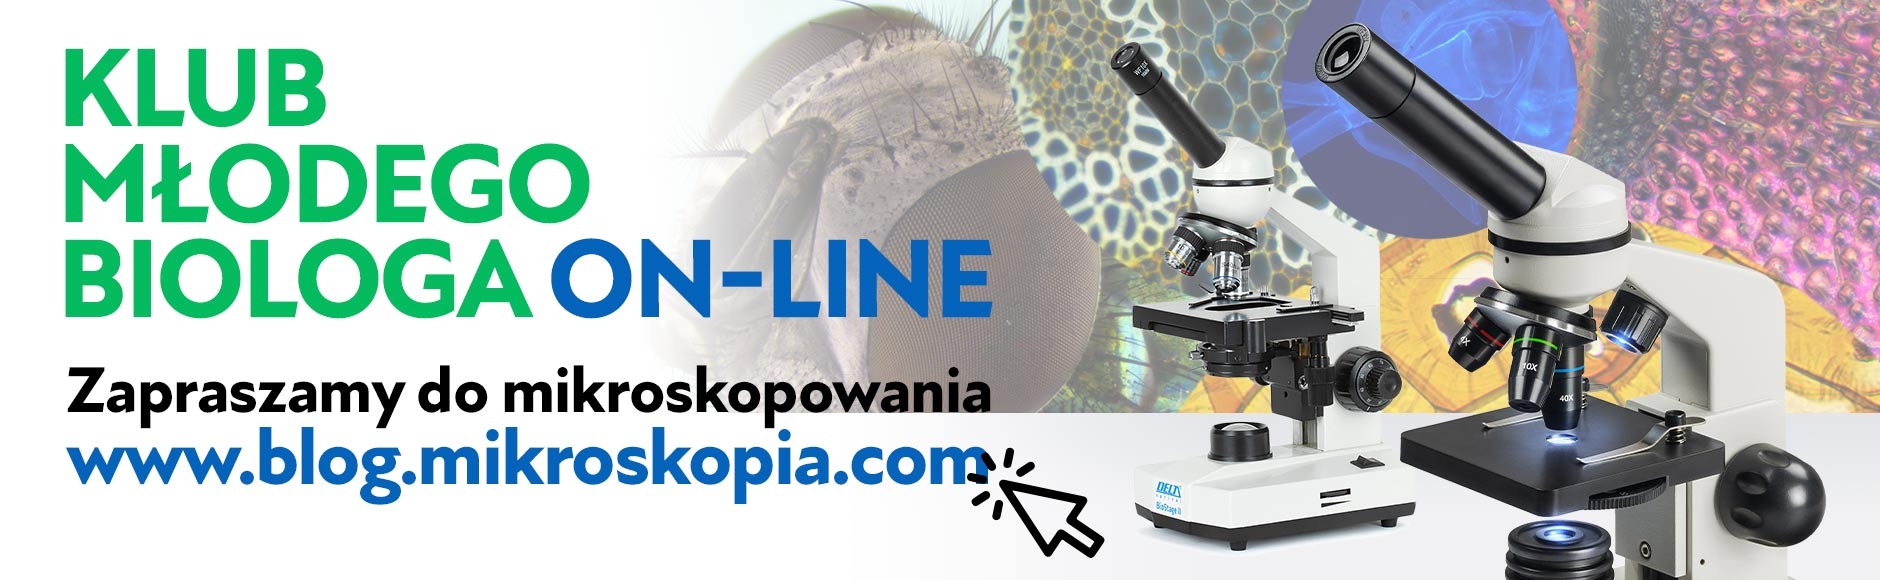 Mikroskopia Blog